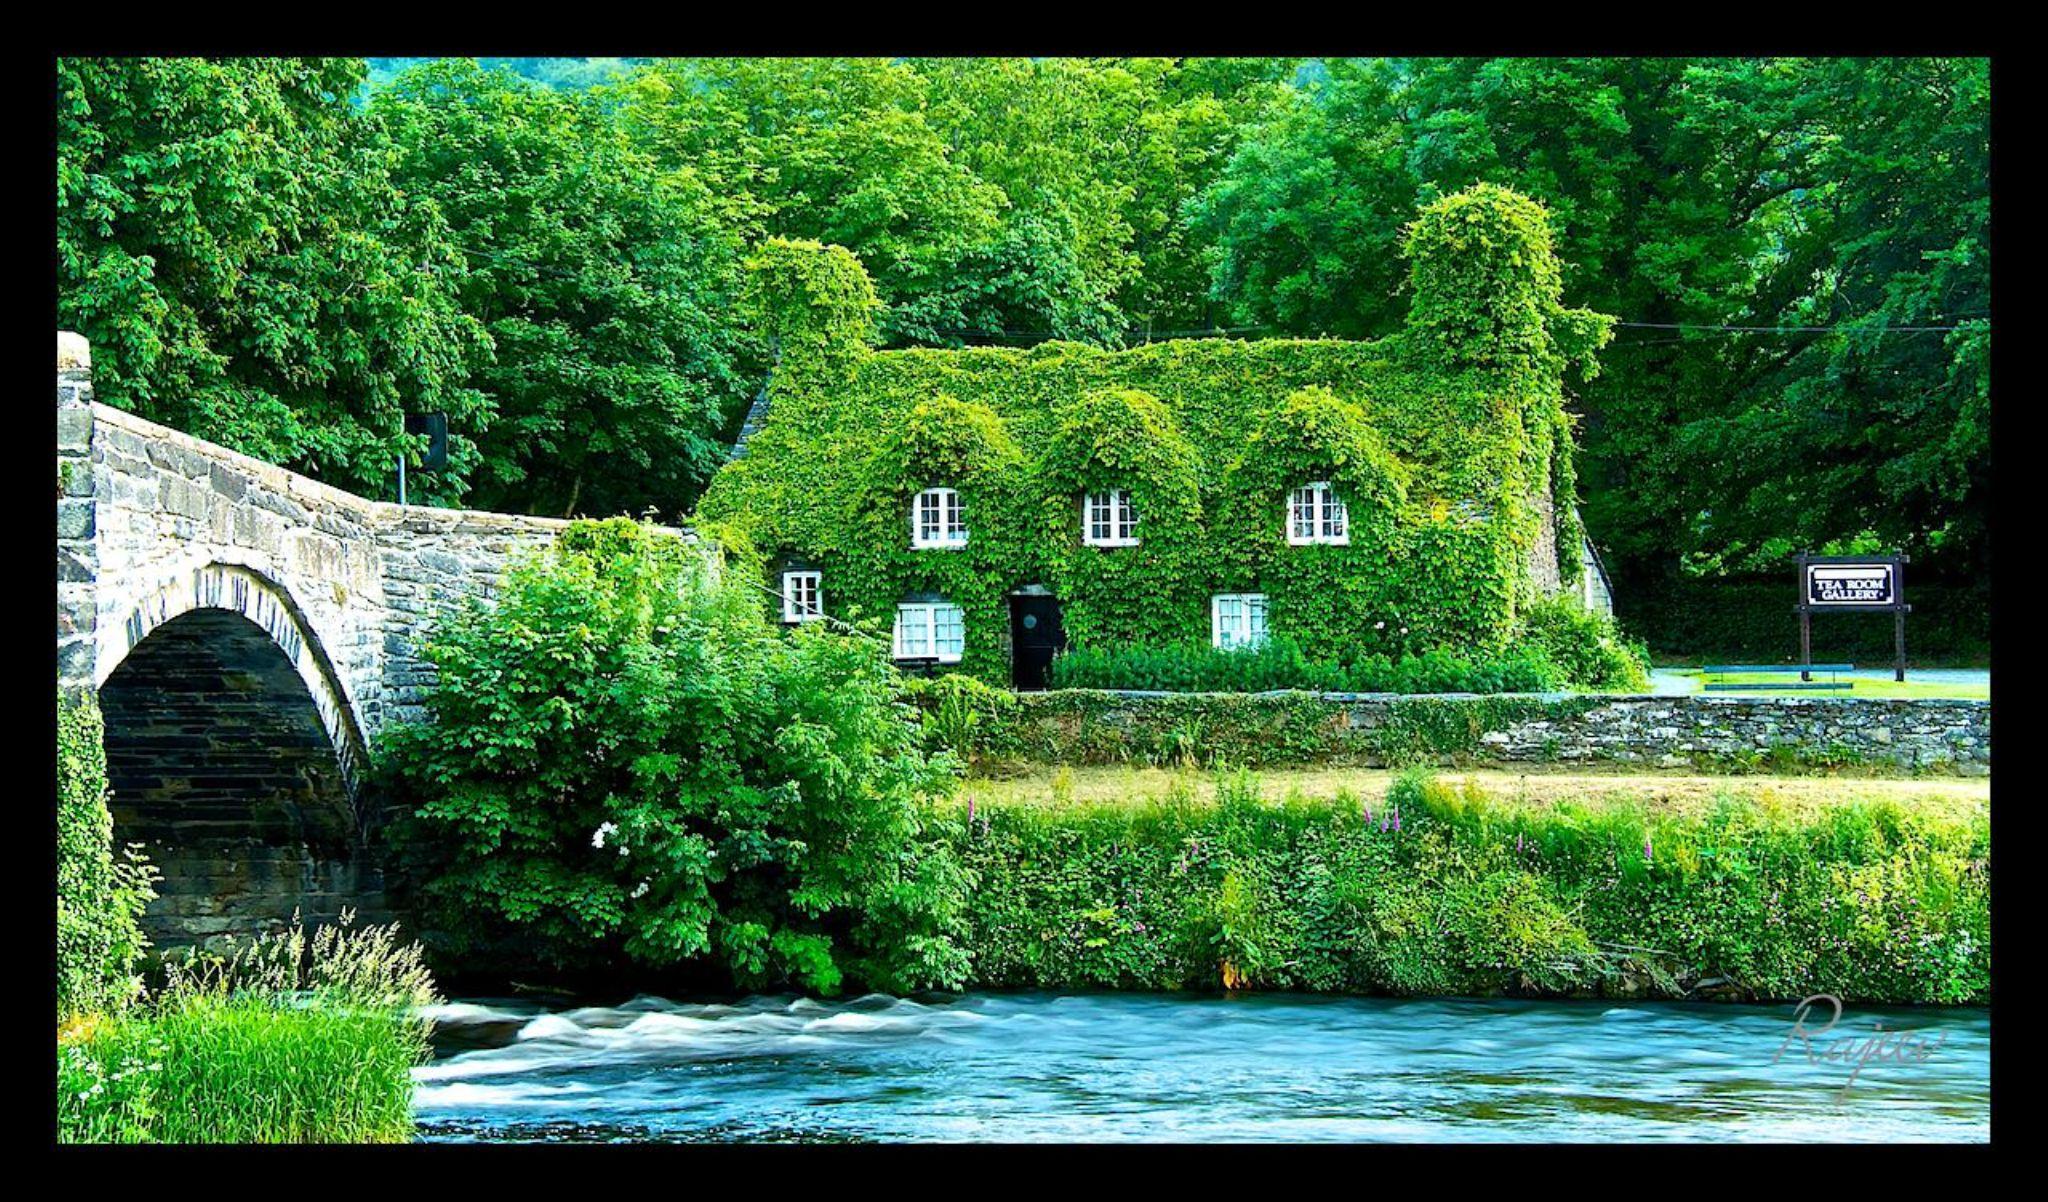 Llanrwst Tea Room, North Wales, UK by rajeevpeeka